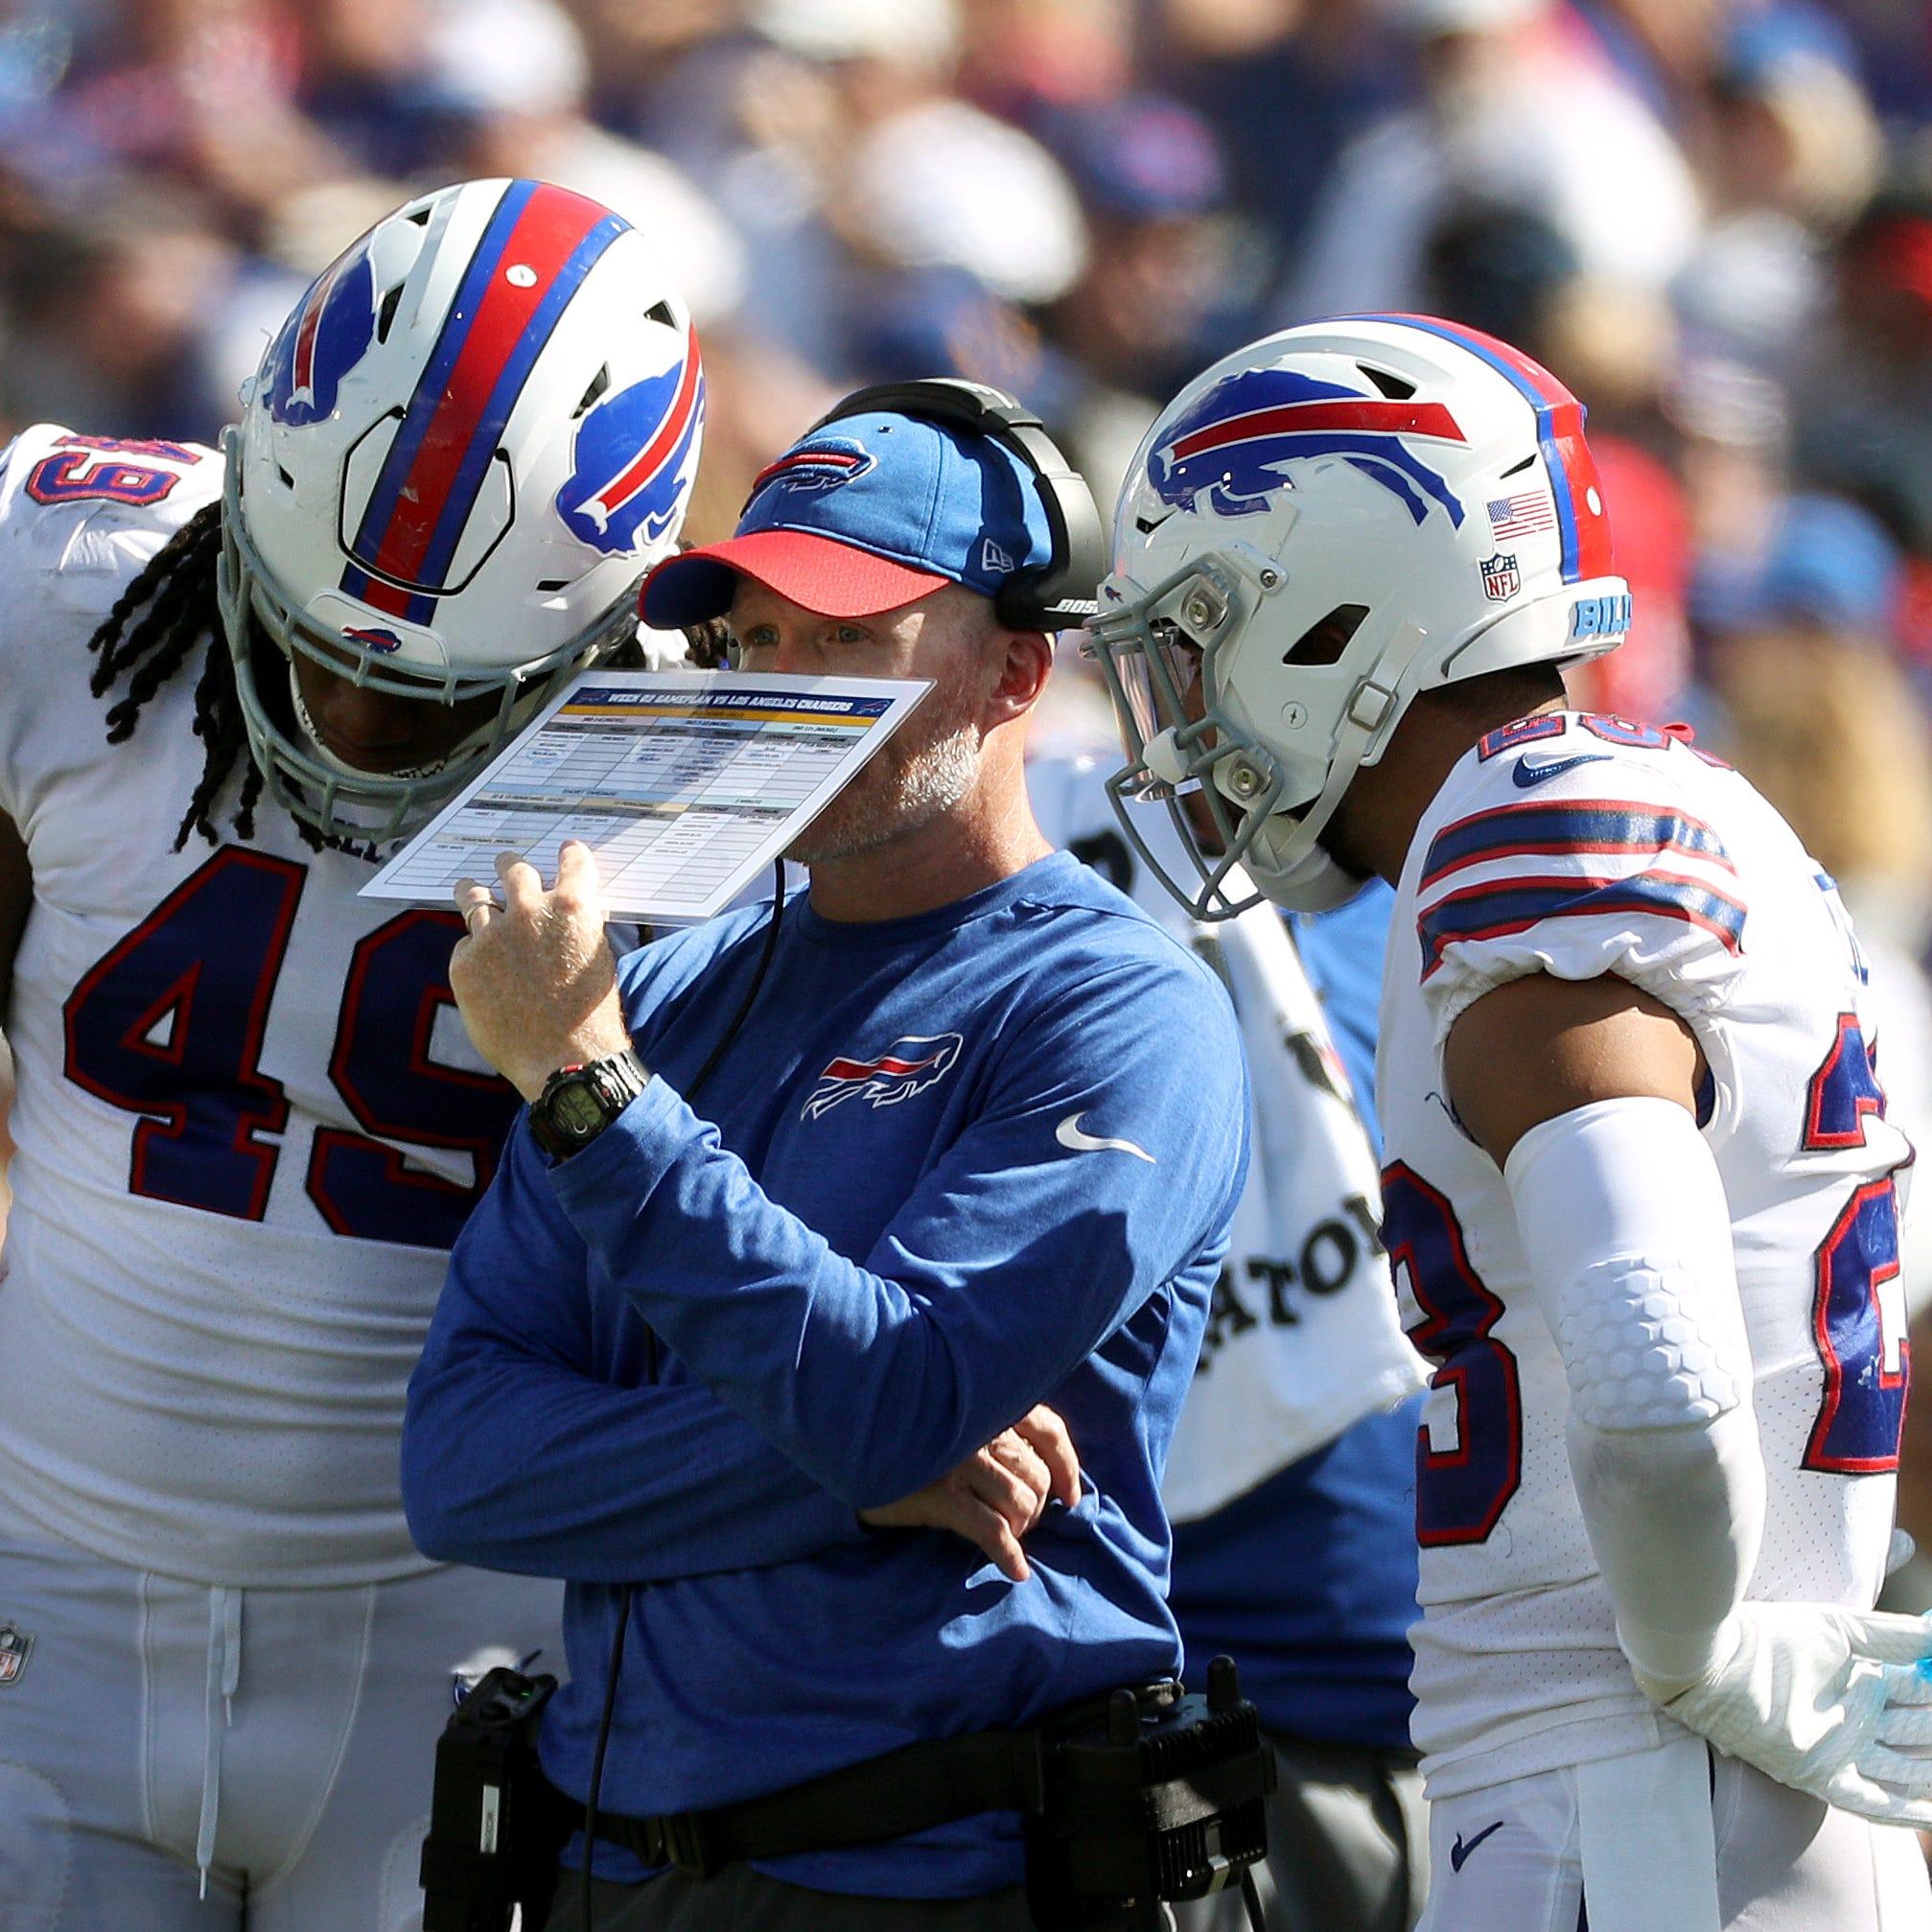 Roth: Bills coach Sean McDermott needs to let Leslie Frazier do his job